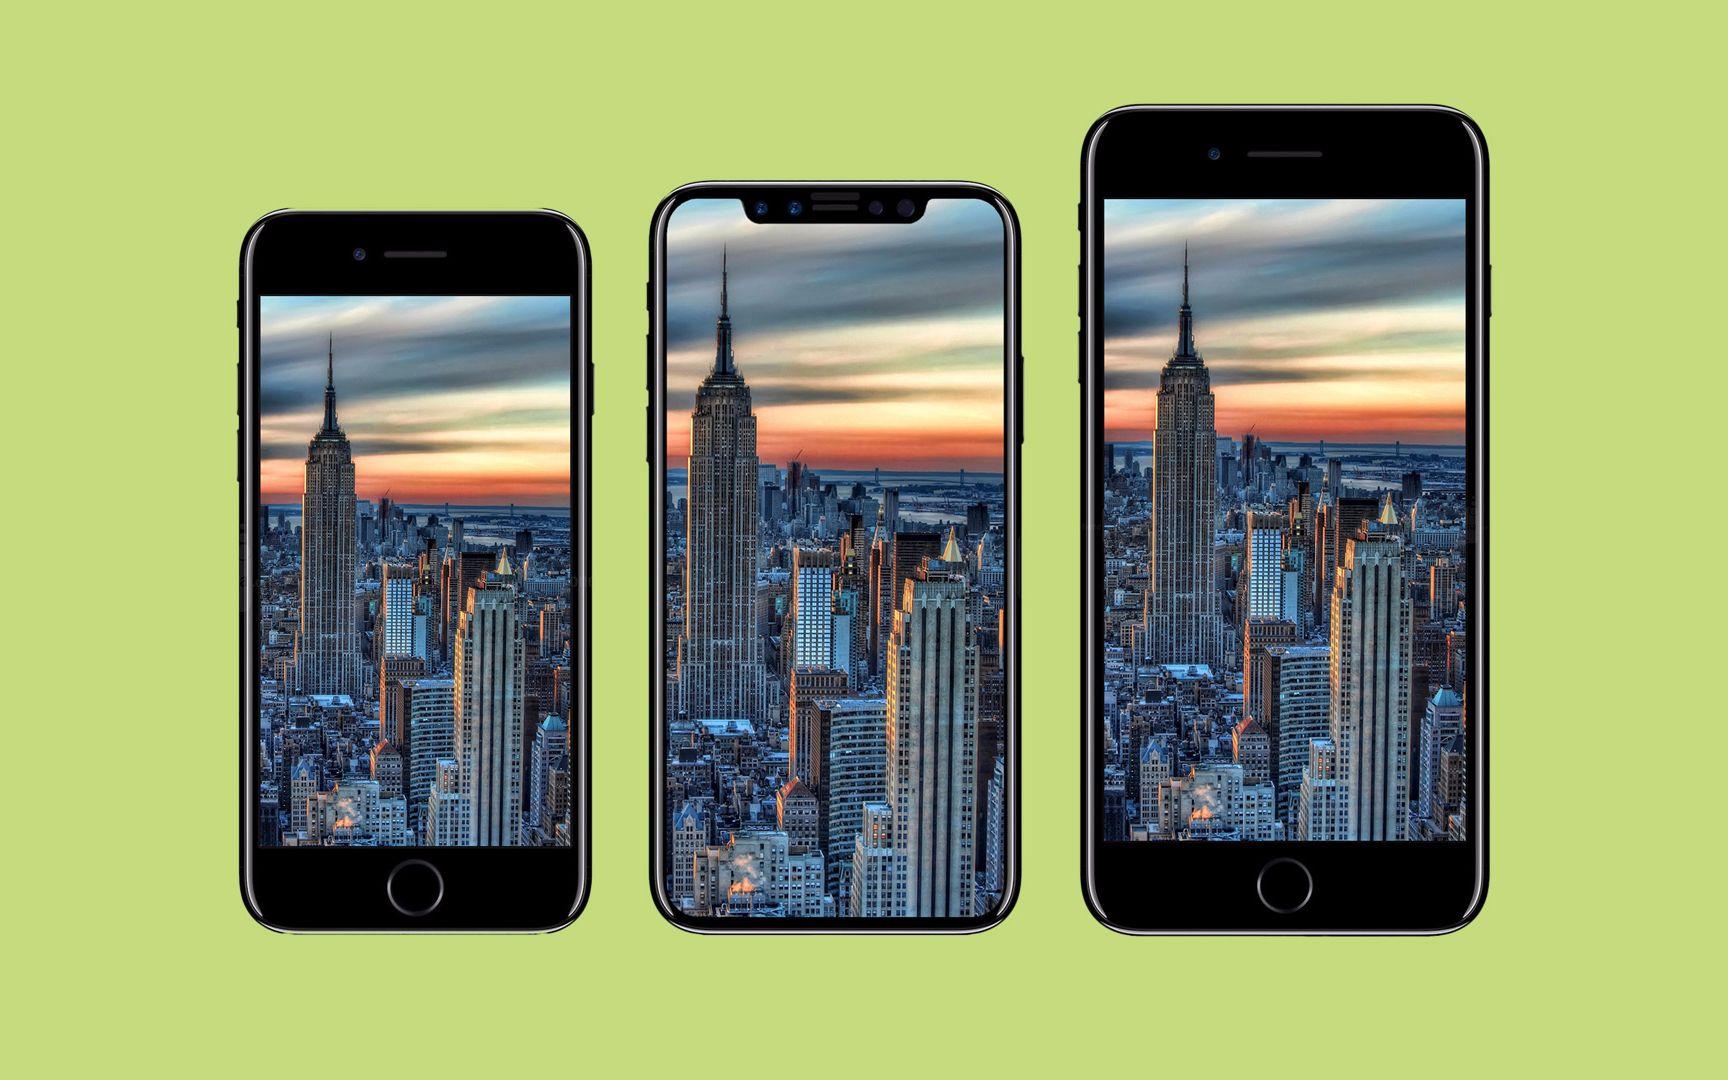 「極光快訊」iPhone 8在尺寸上完虐三星S8/HTC U11被曝屏幕出問題_嗶哩嗶哩 (゜-゜)つロ 干杯~-bilibili